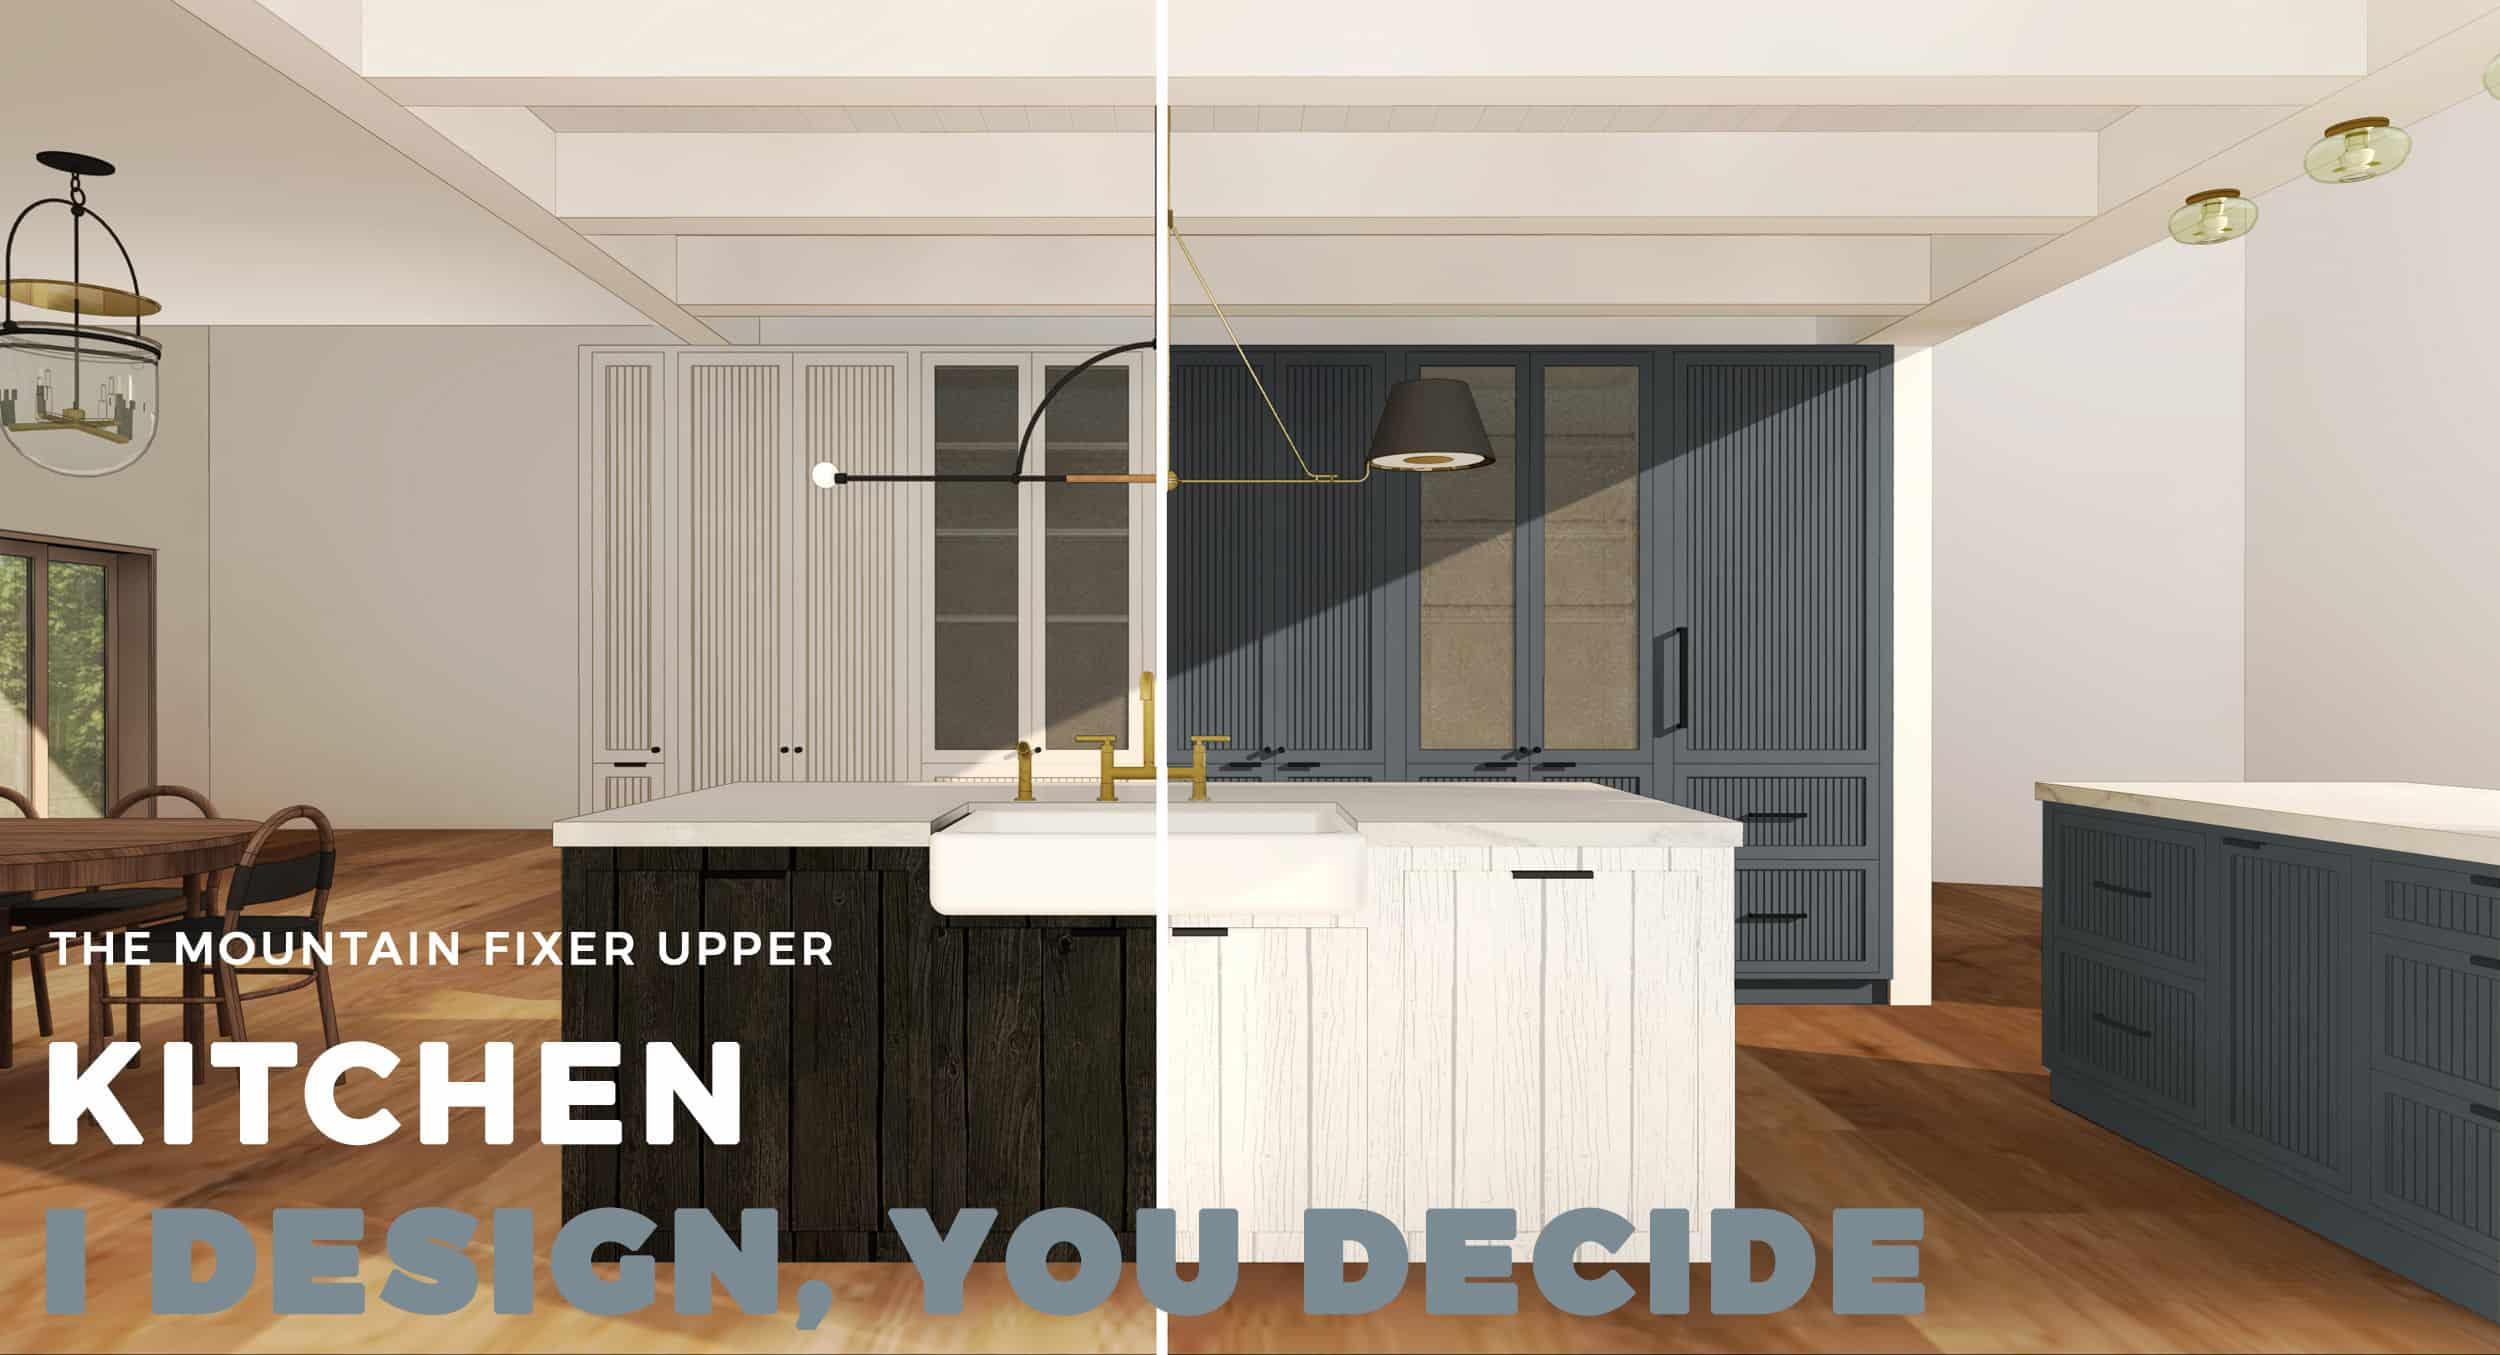 Emily Henderson Mountain Fixer Upper I Design You Decide Kitchen Sidebyside Header 01